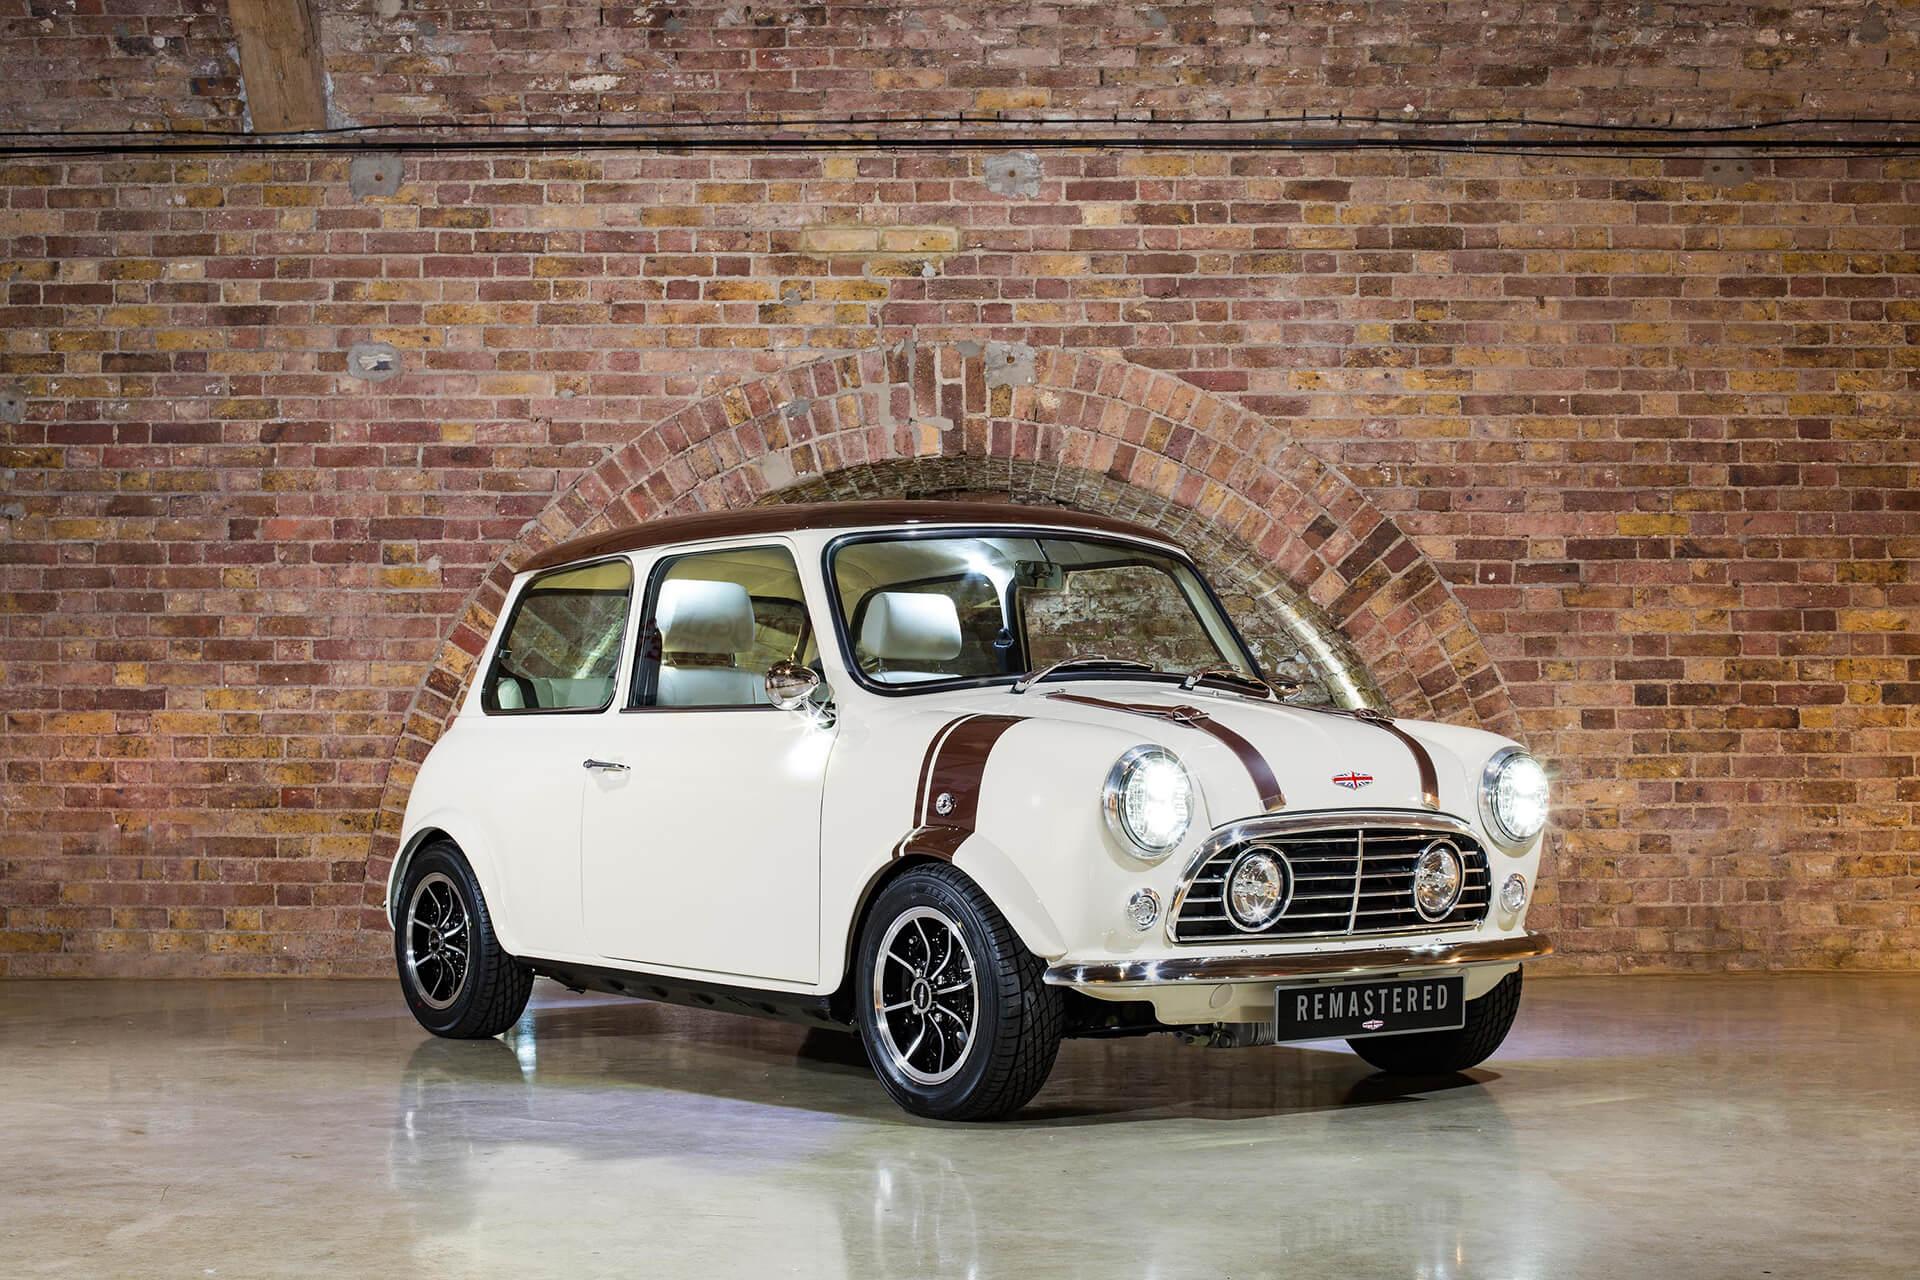 David Brown Automotive Mini Remastered